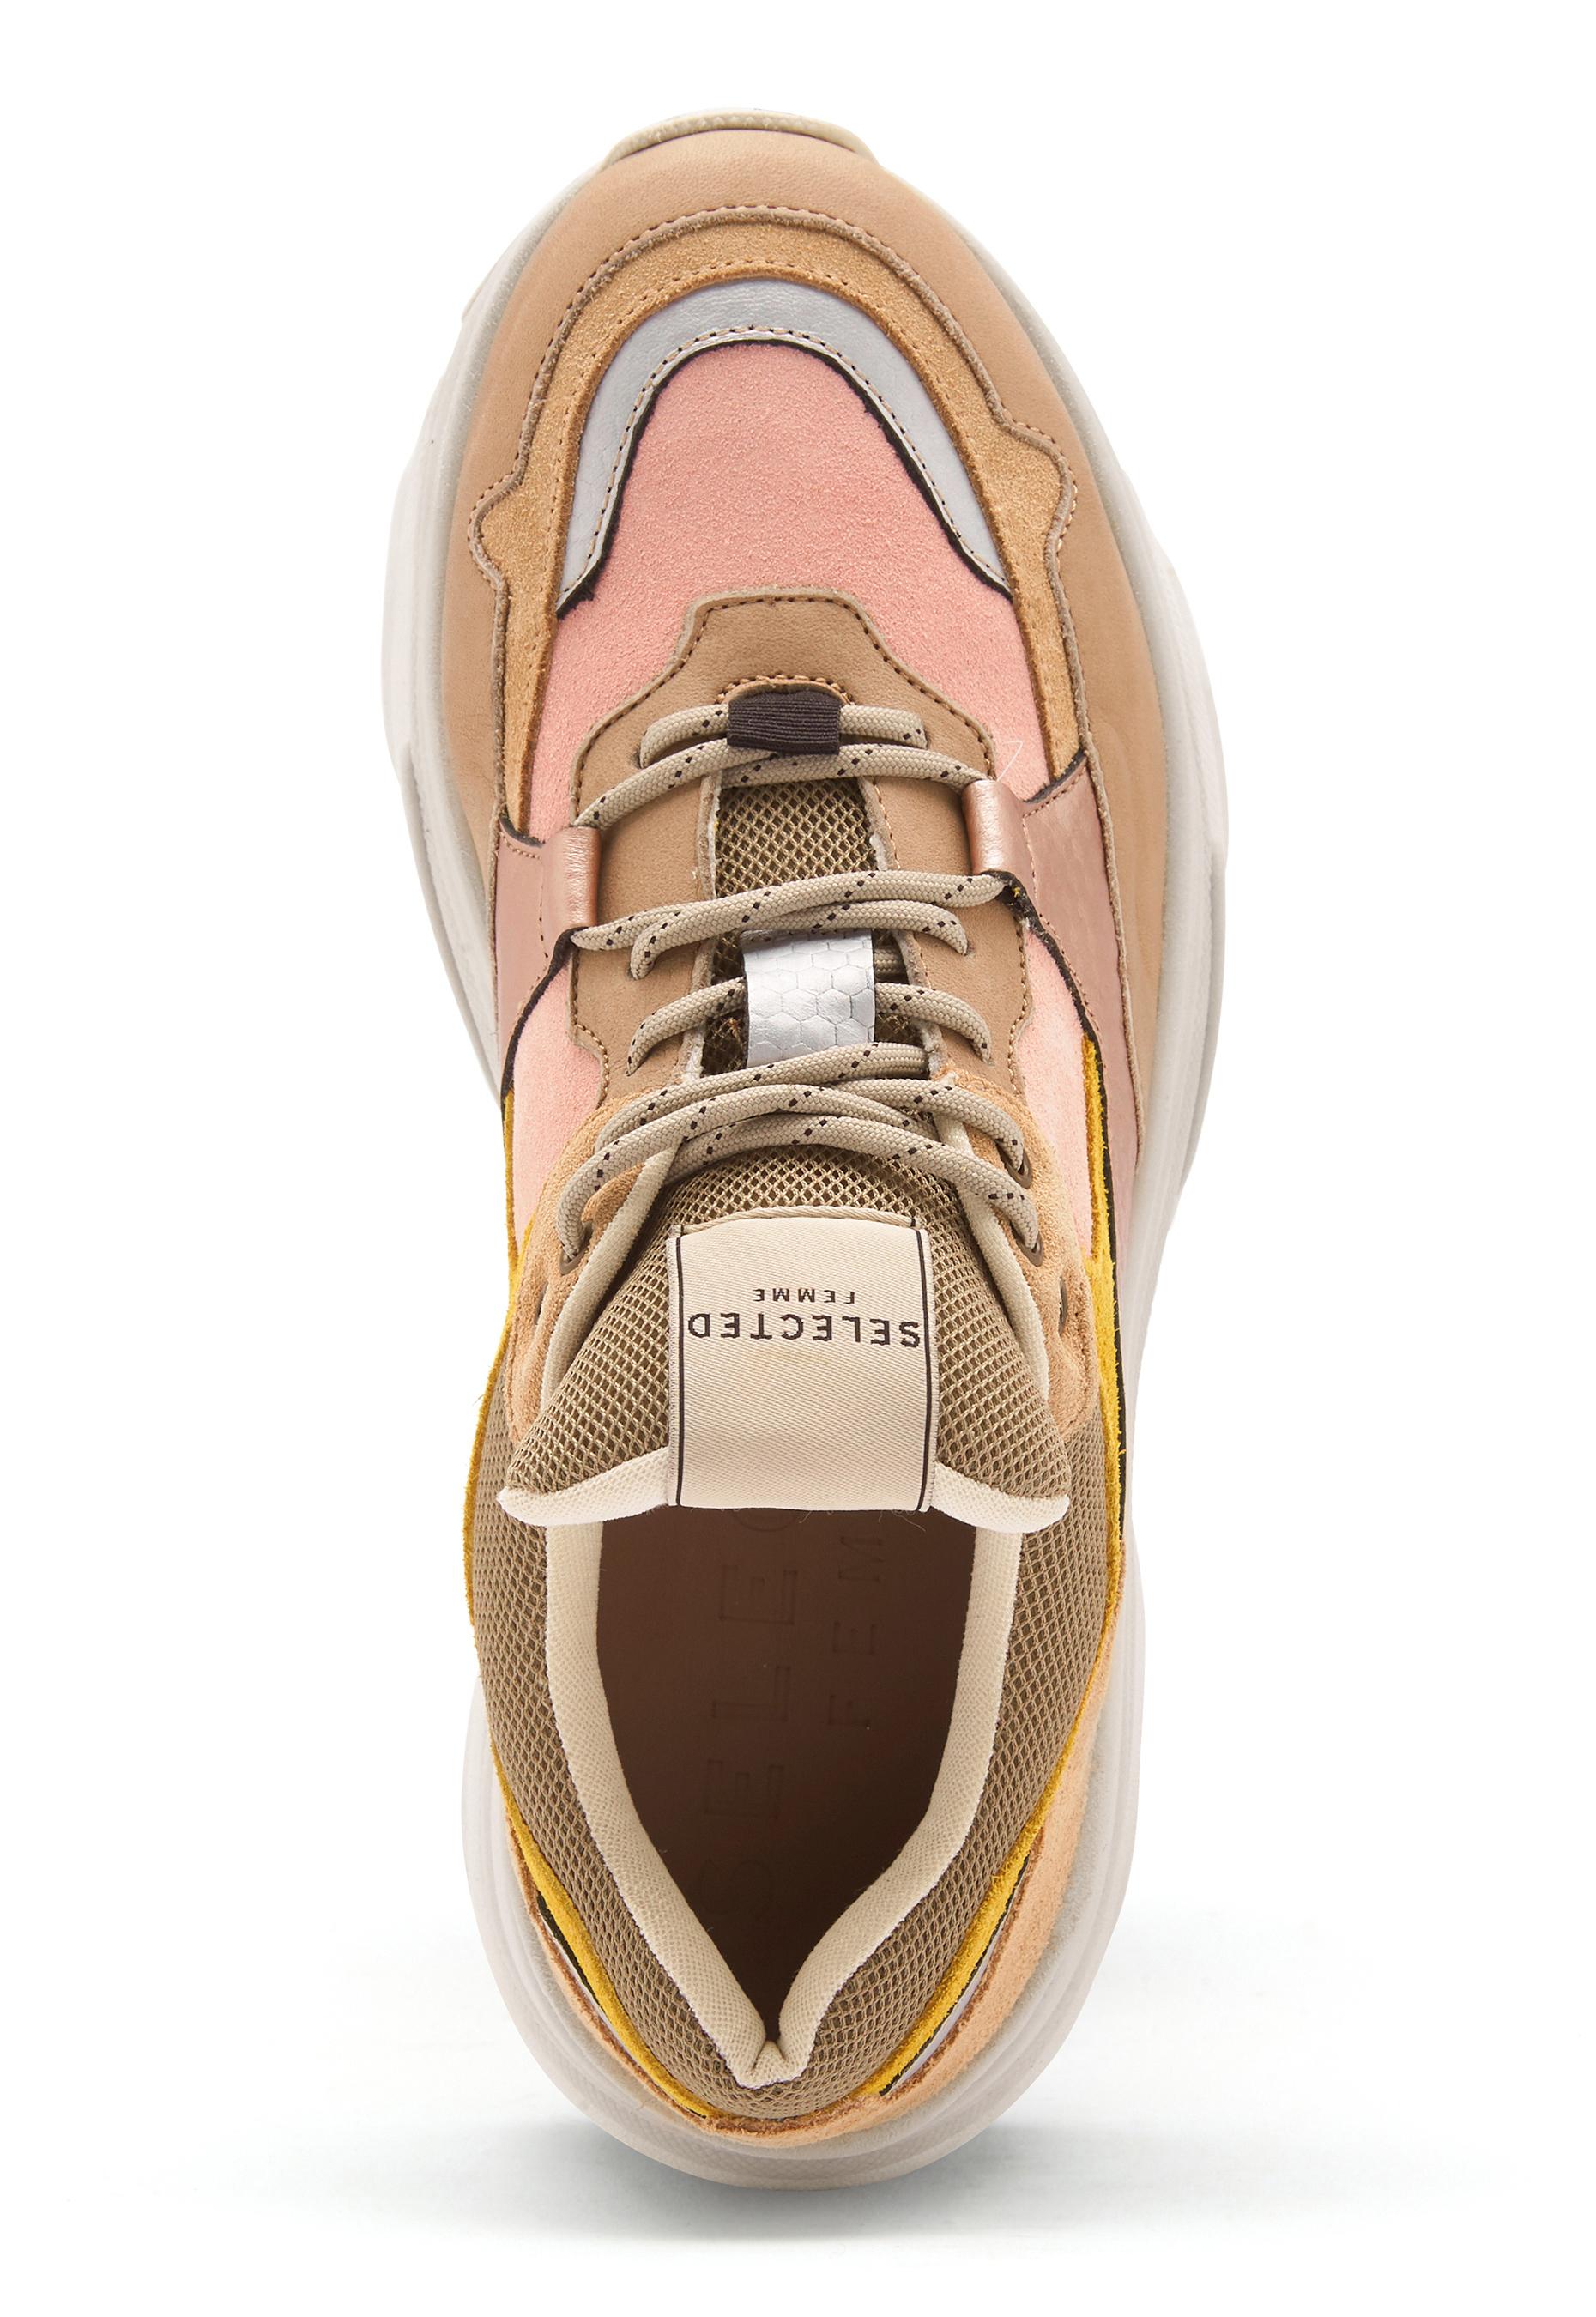 87a6b9683bd SELECTED FEMME Gavina Trainer Shoes Heavenly Pink - Bubbleroom